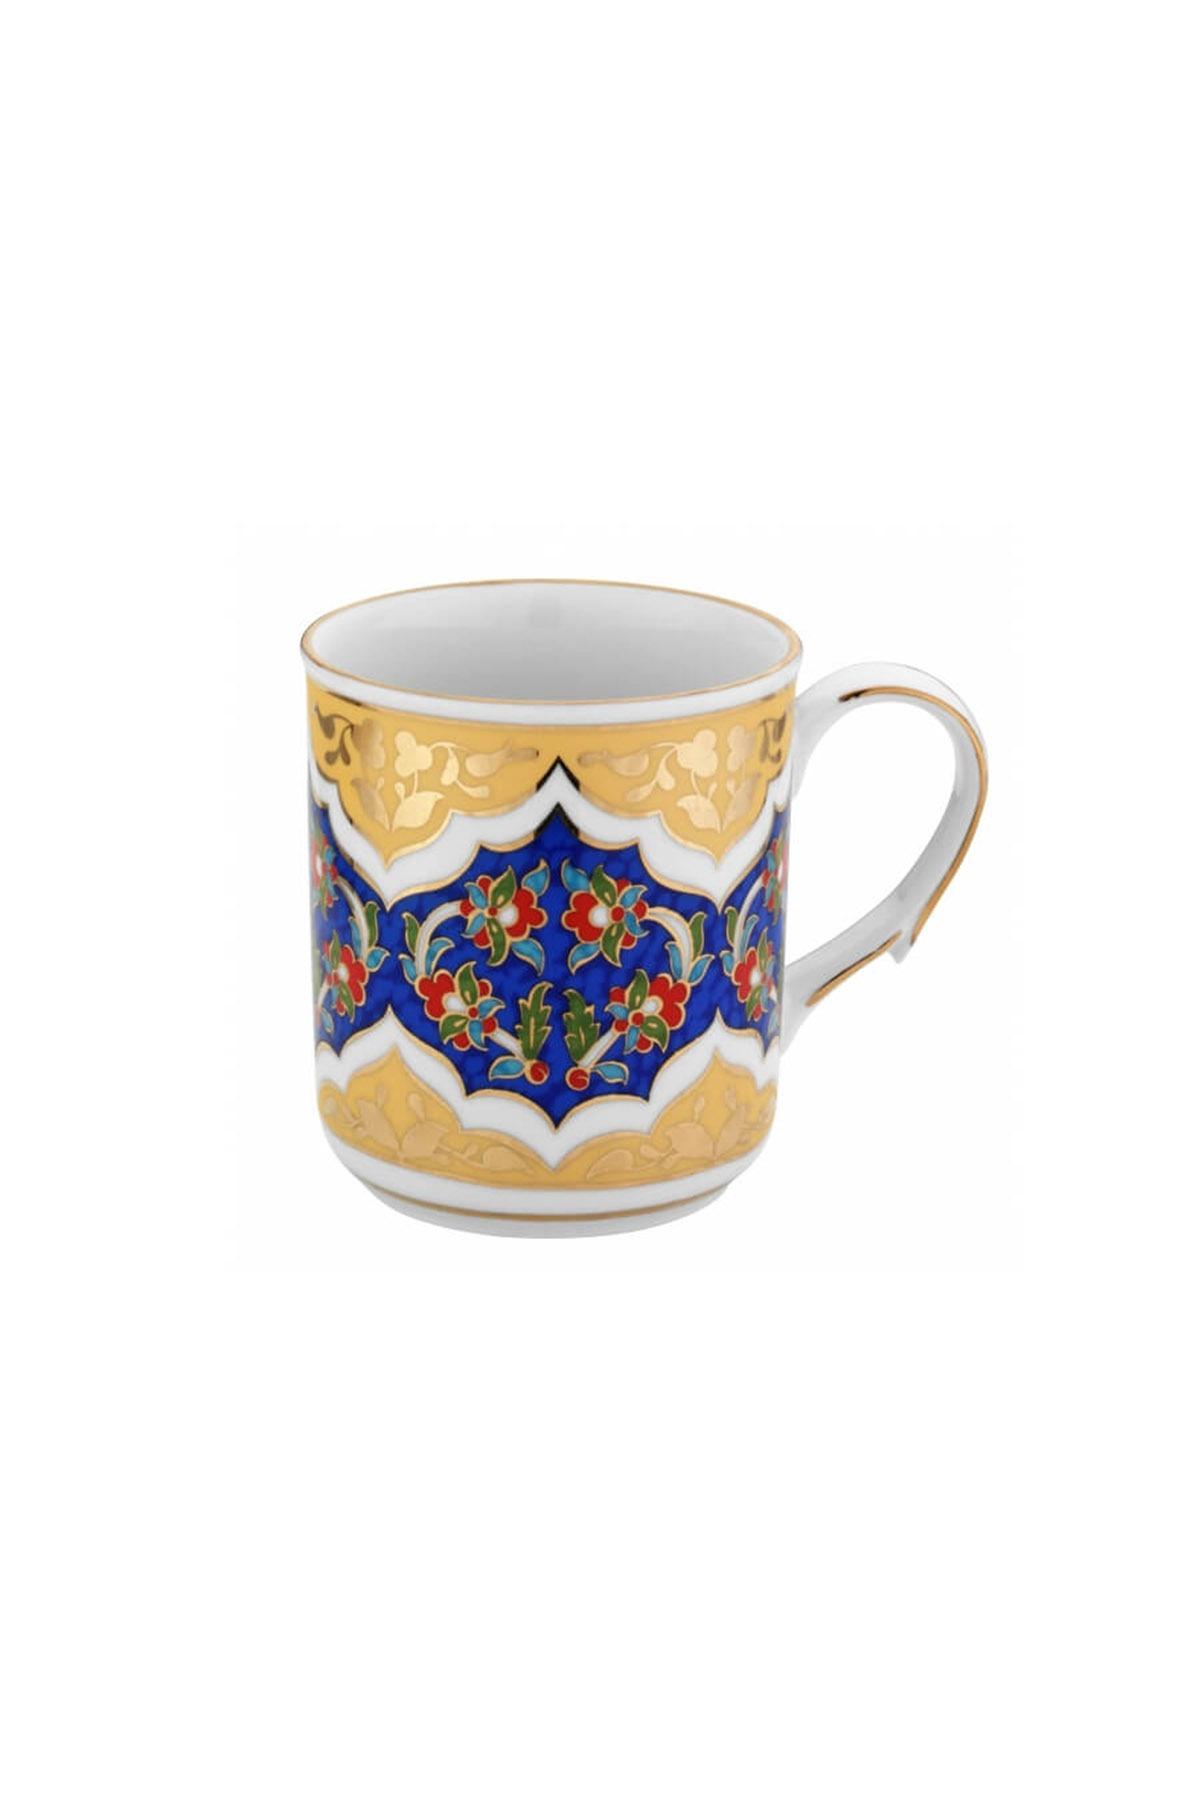 Kütahya Porselen - Kupa Bardak Dekor No:3880